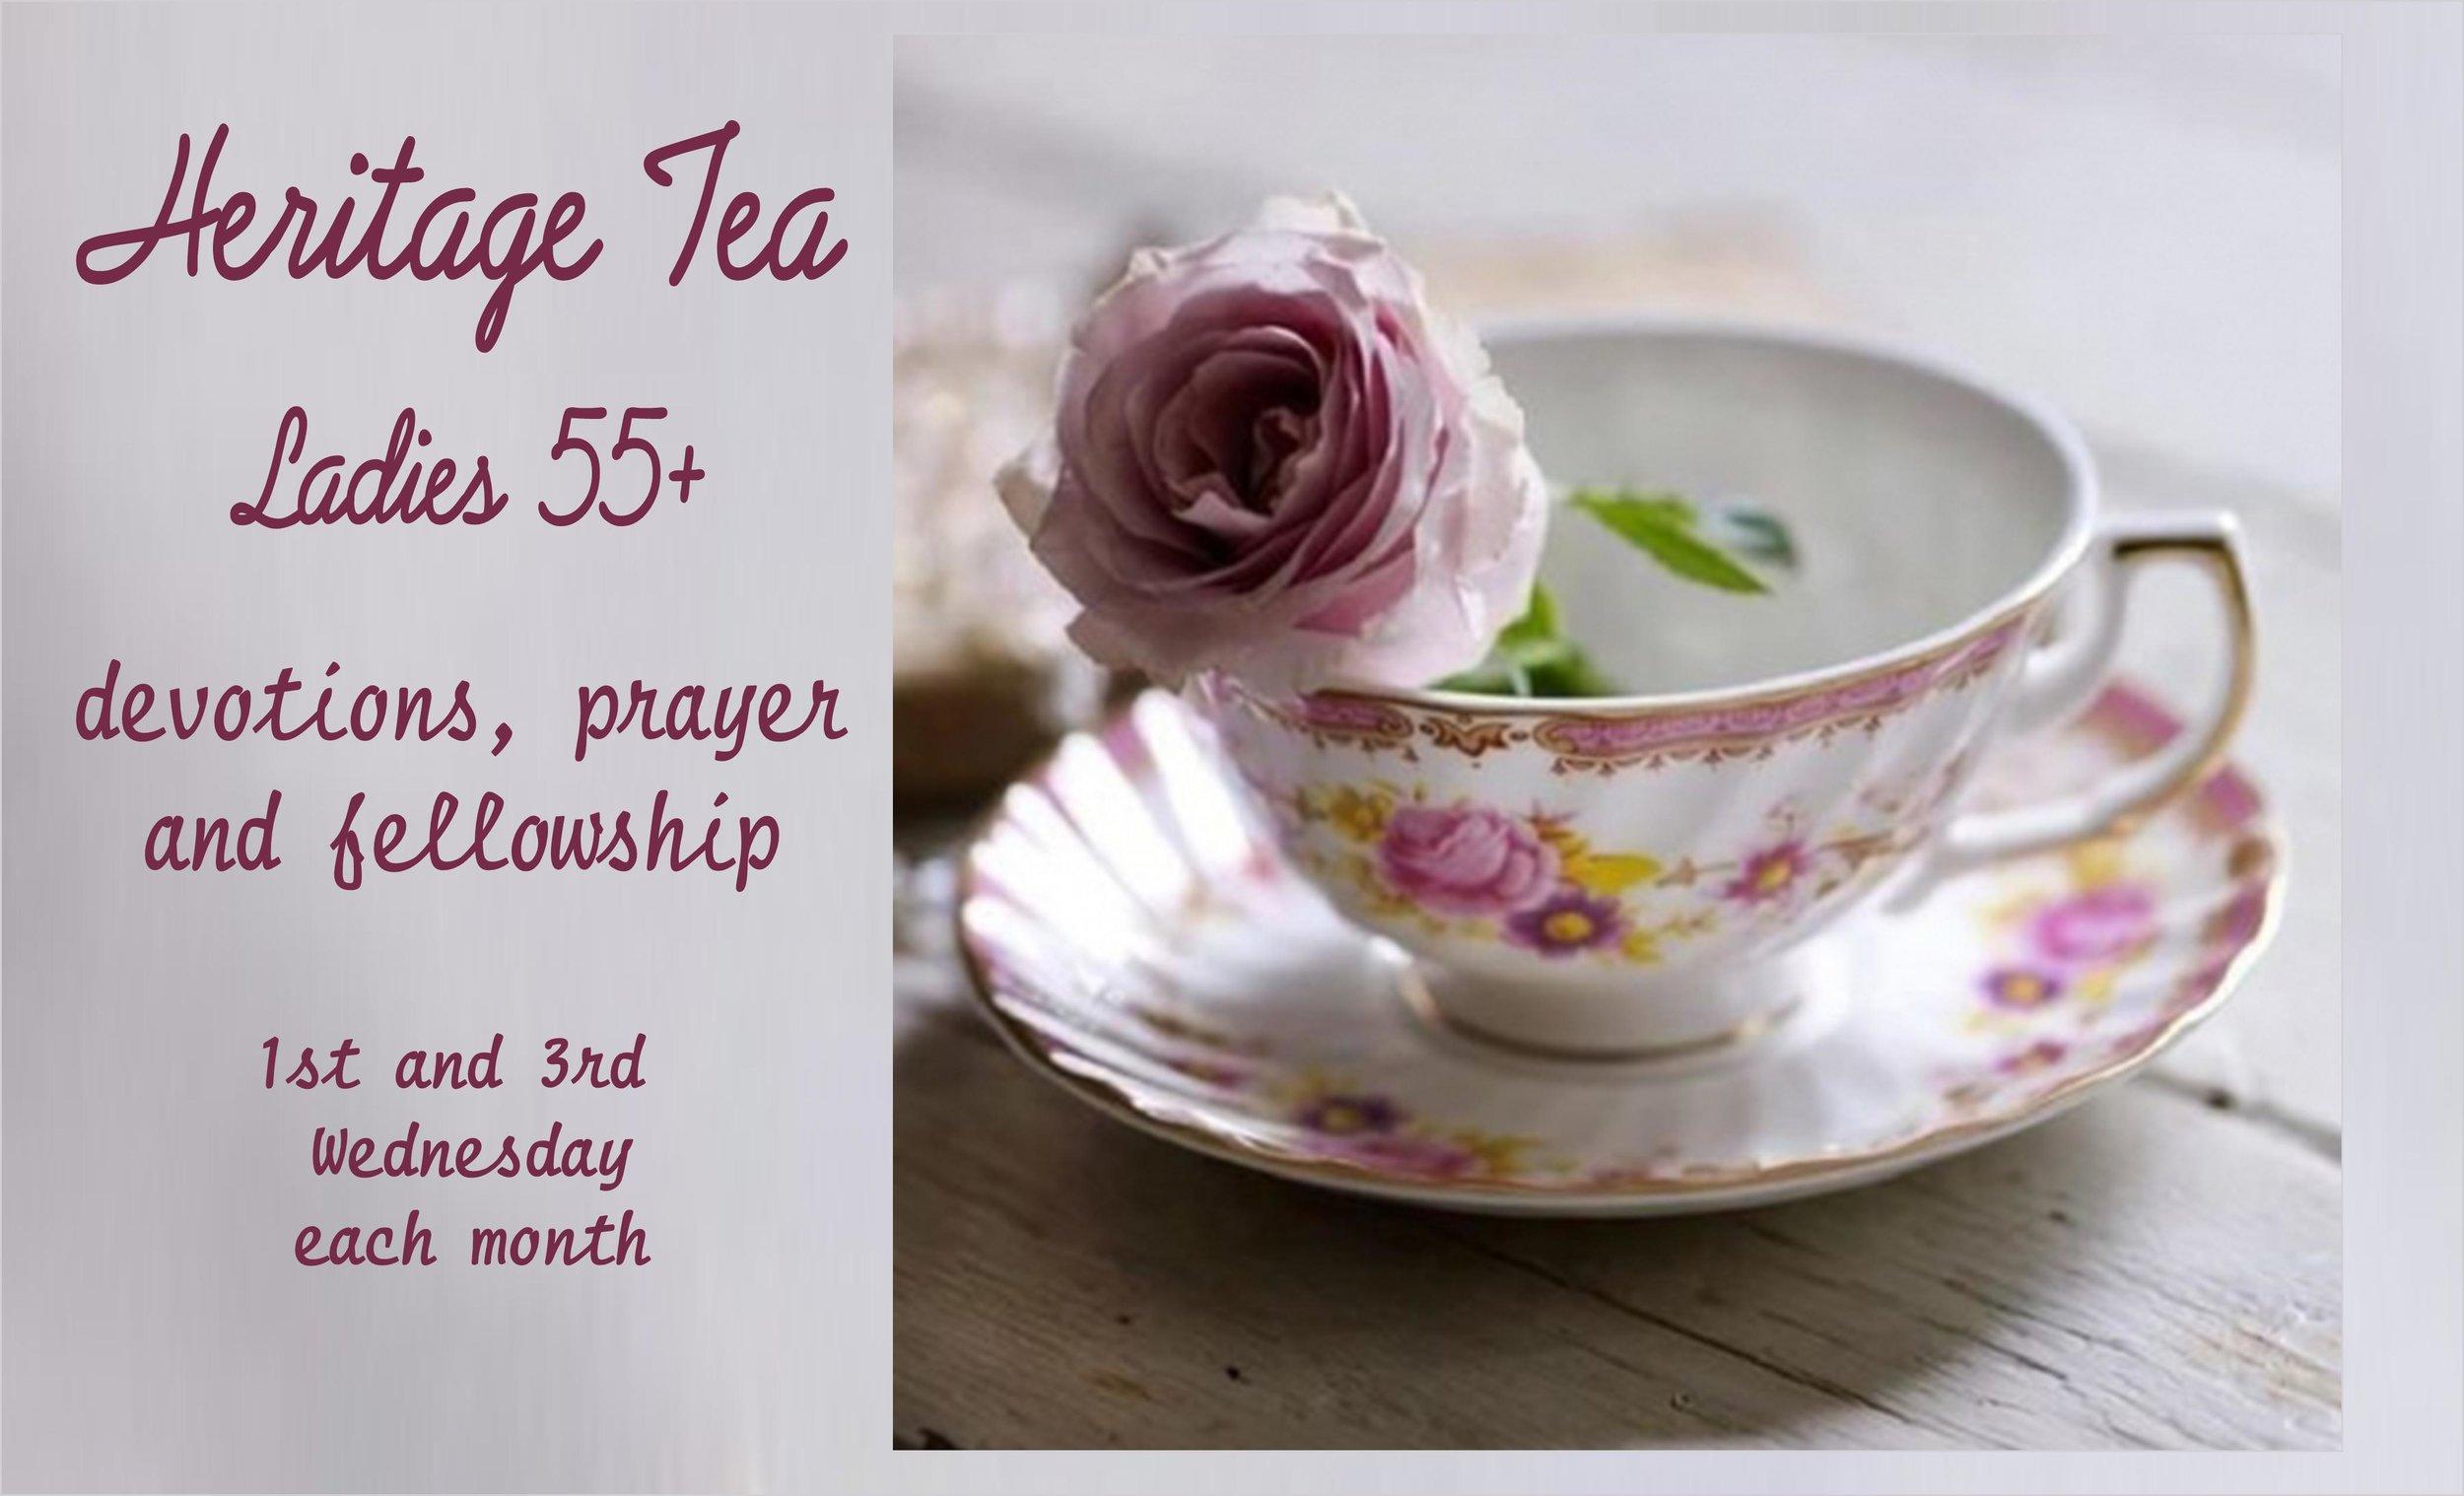 heritage tea graphic 2017.jpg